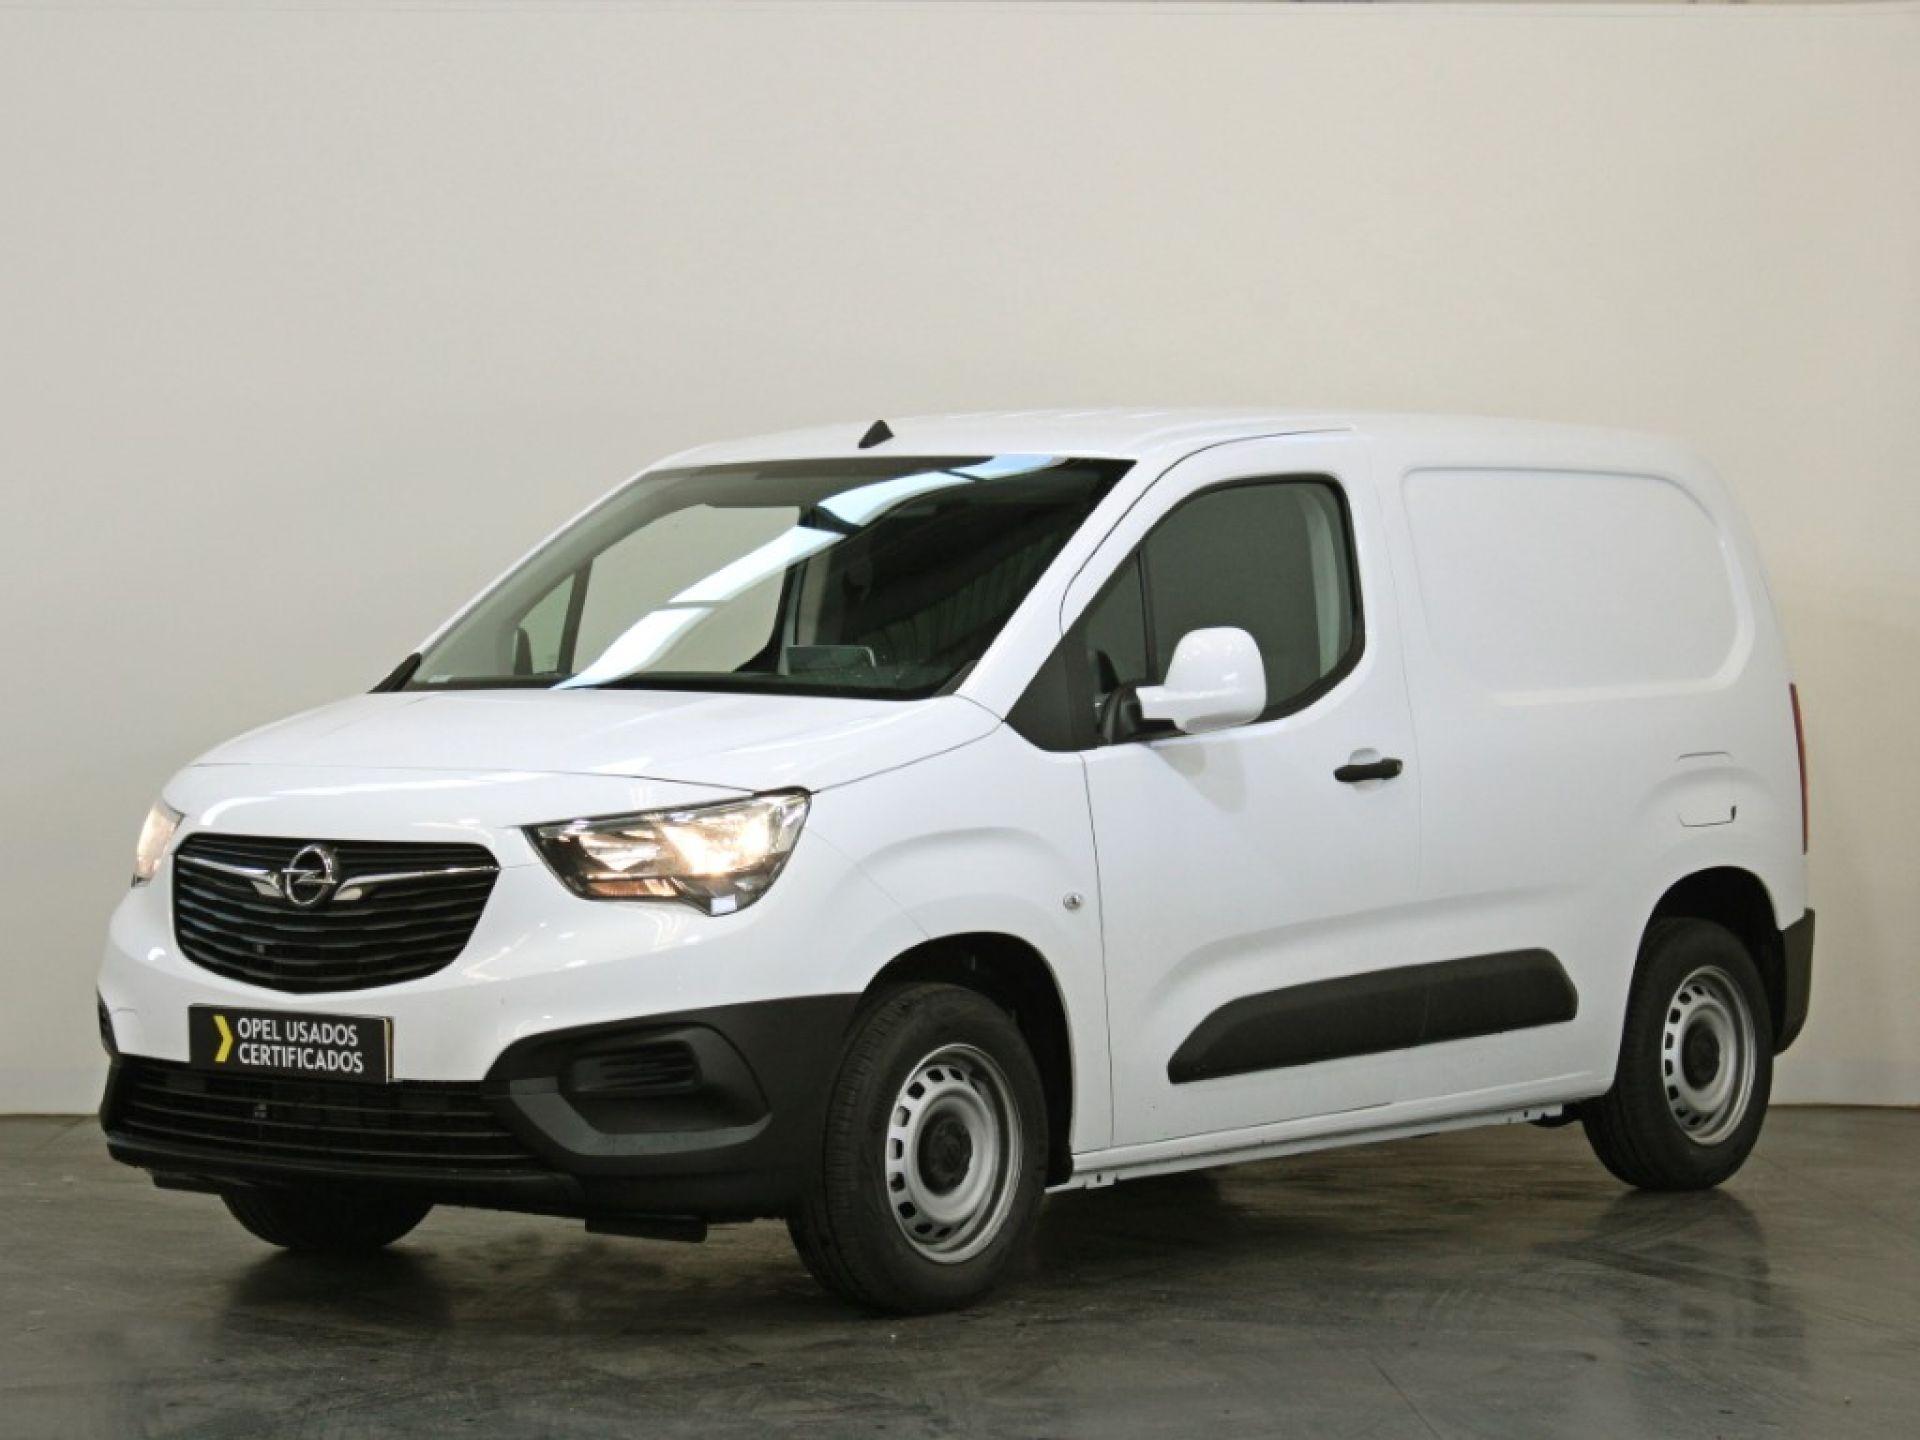 Opel Combo Enjoy van L1H1 STD 1.6 100CV segunda mão Porto